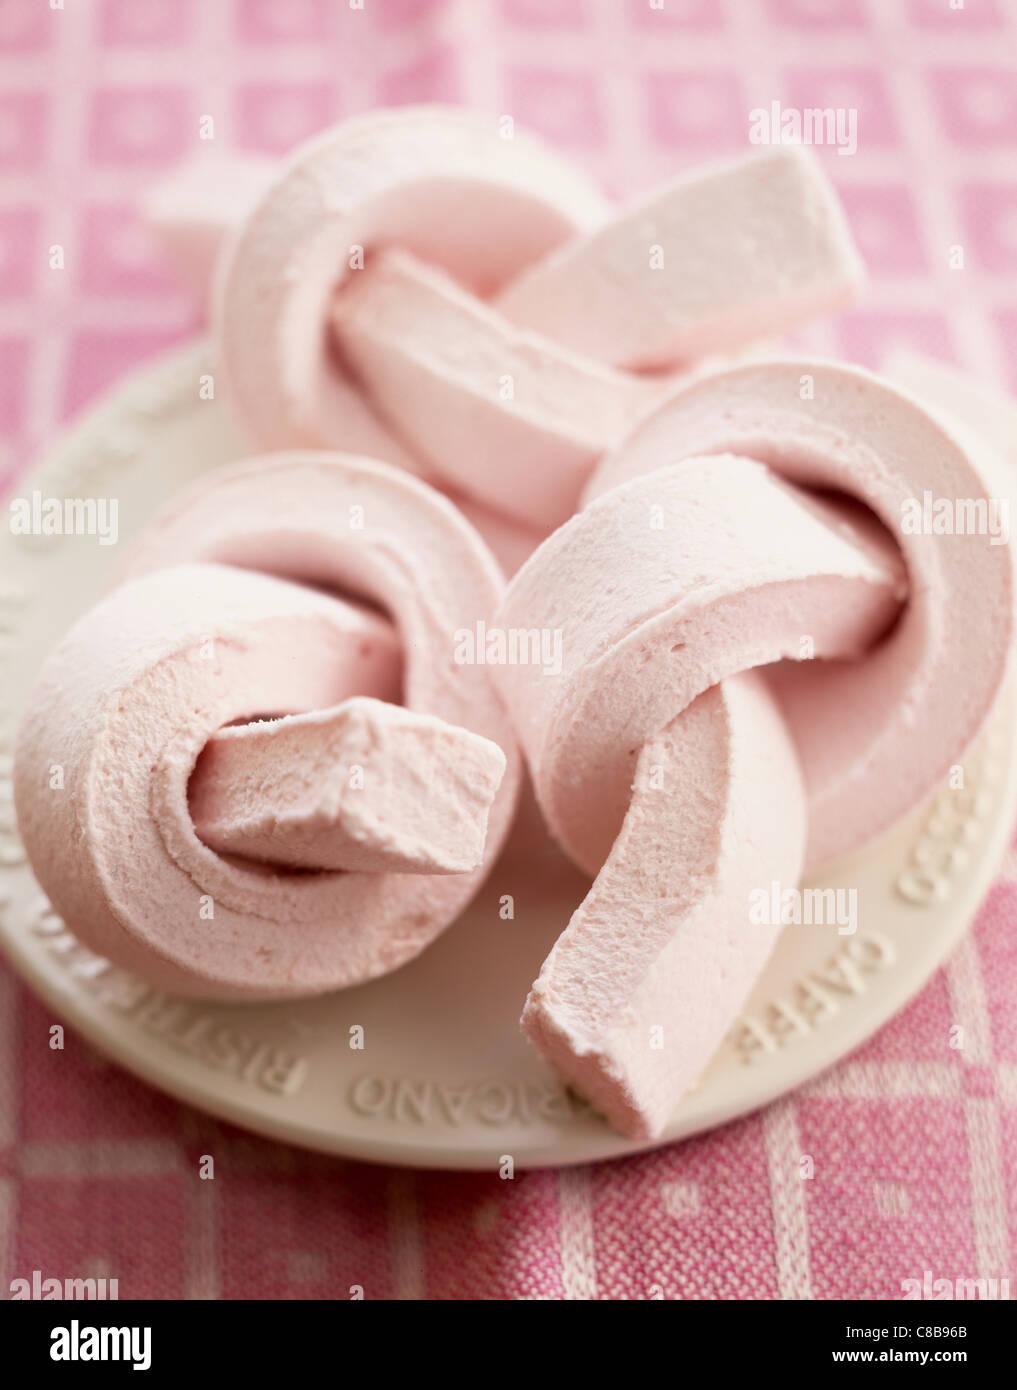 Marshmallow Wendungen auf Platte Stockbild